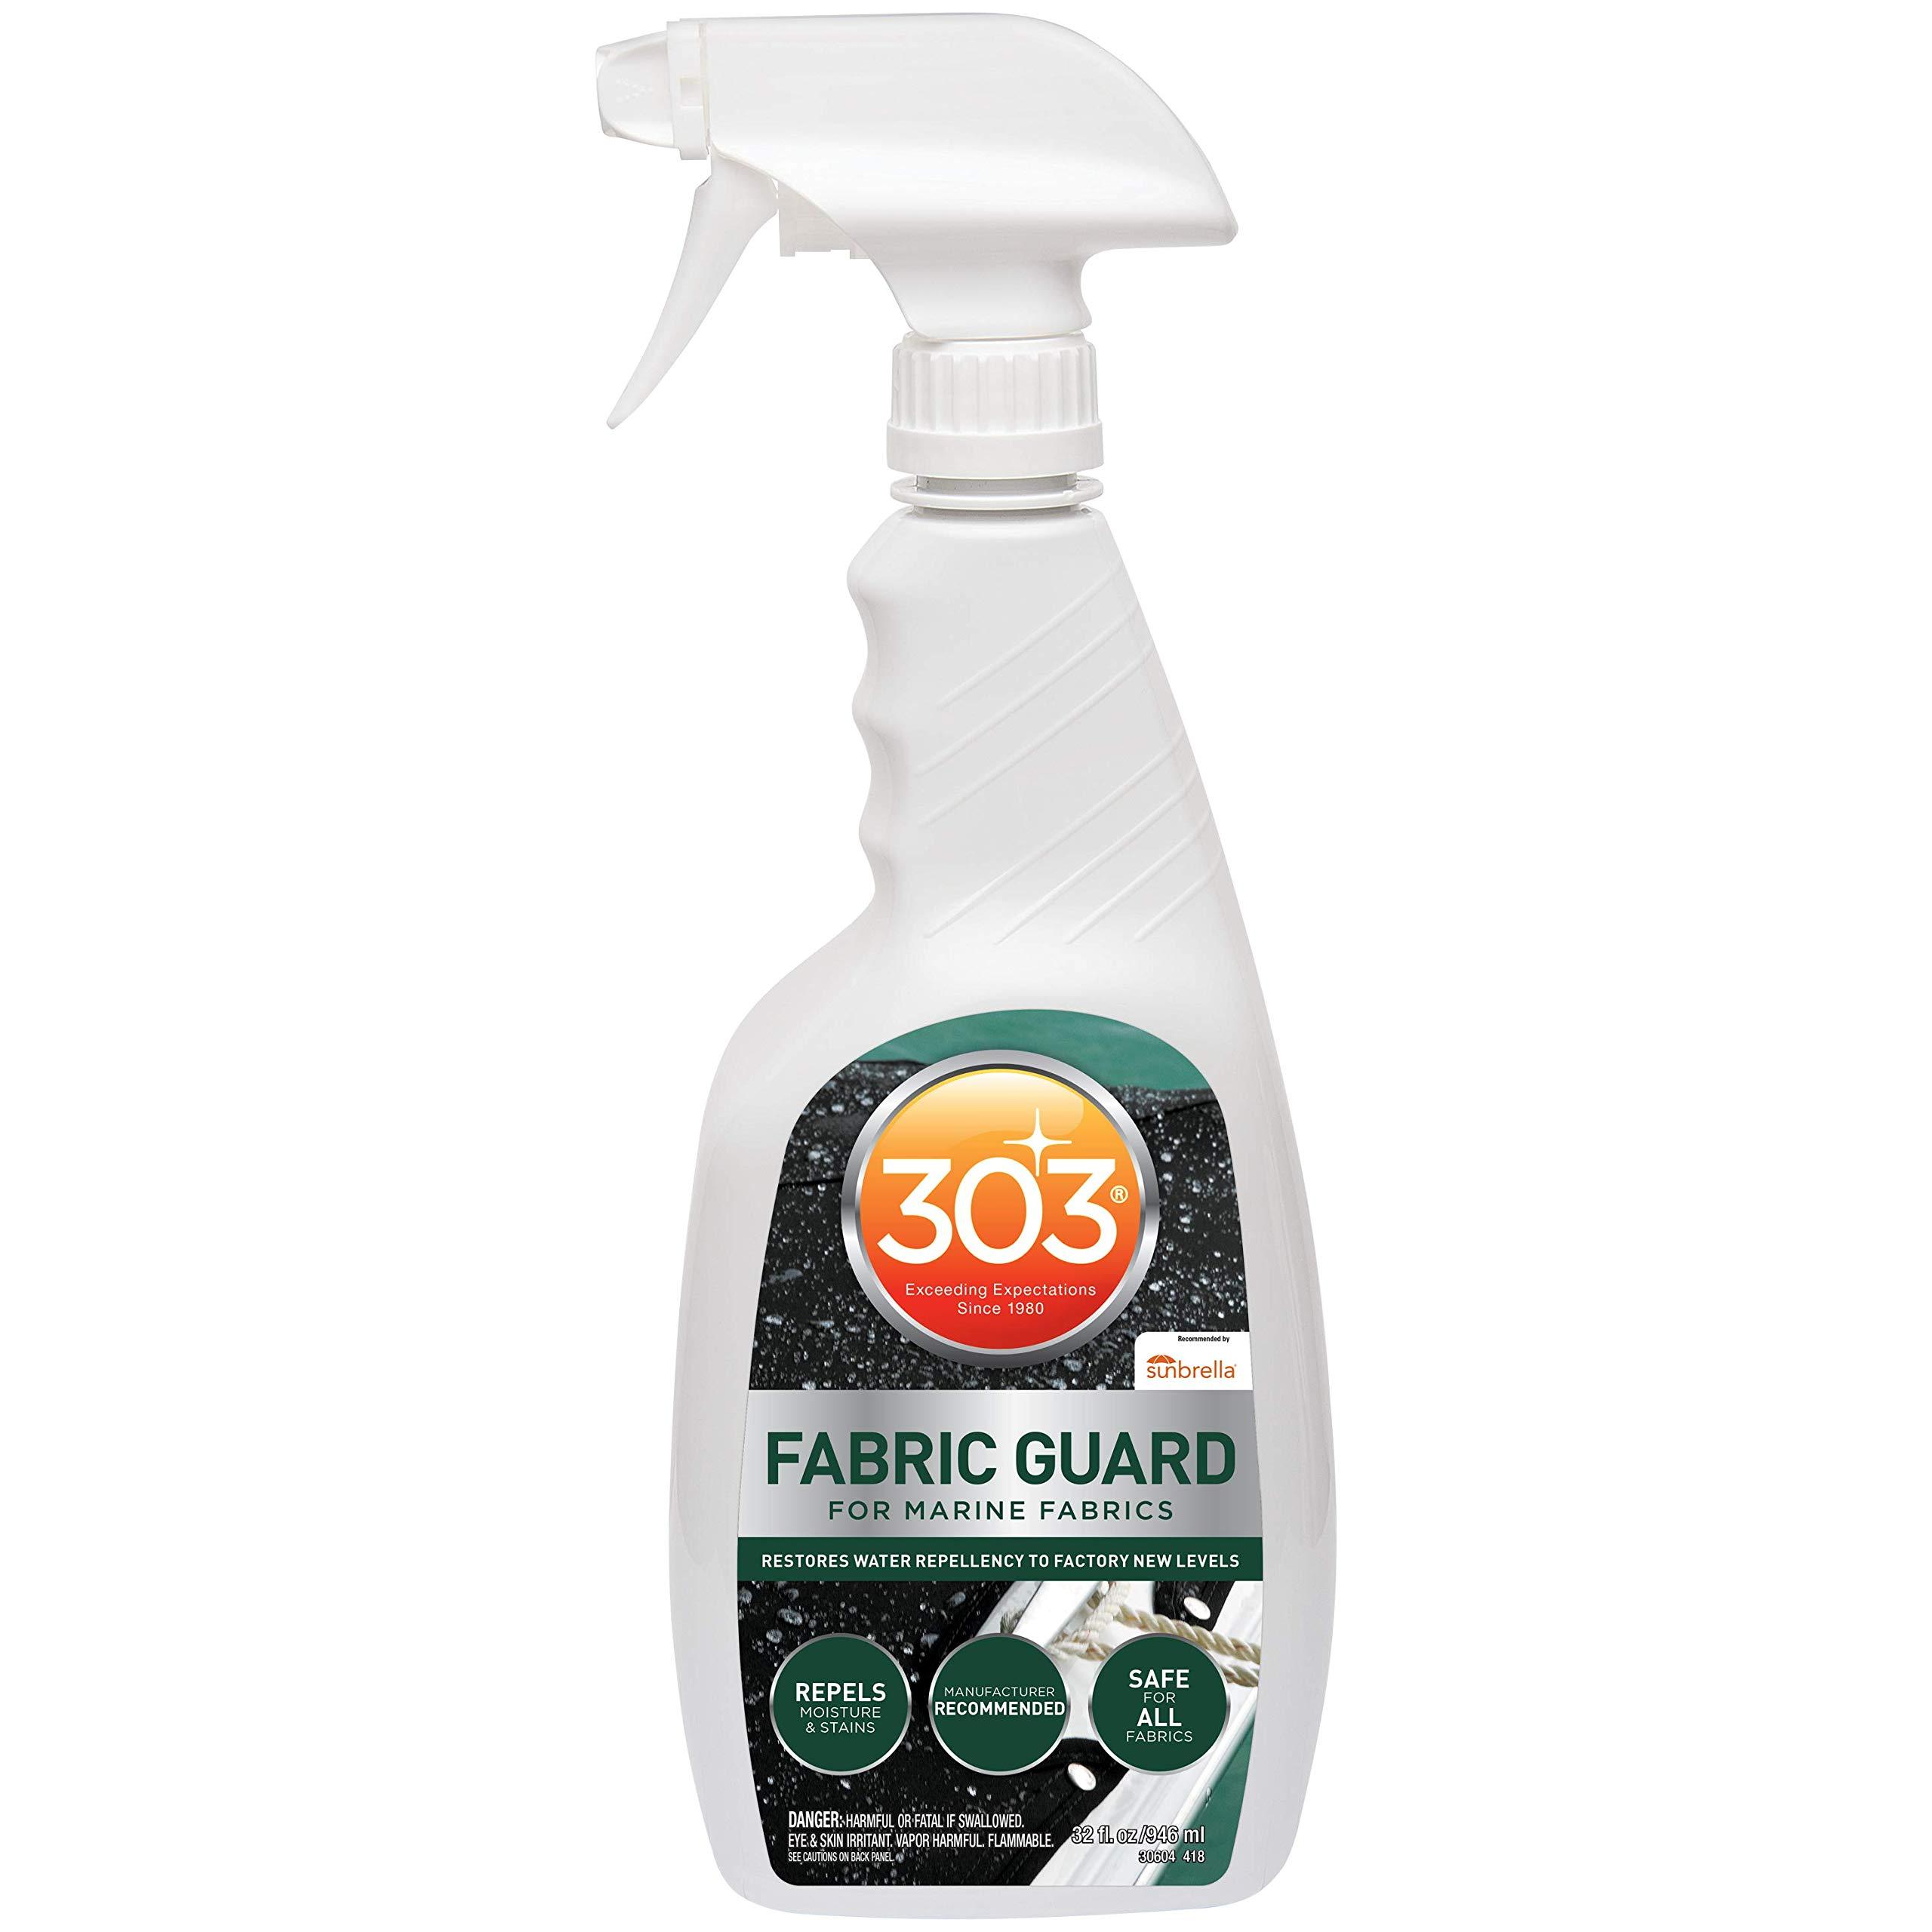 303 30604CSR (30604) Fabric Guard Trigger Sprayer, 32 Fl. oz.